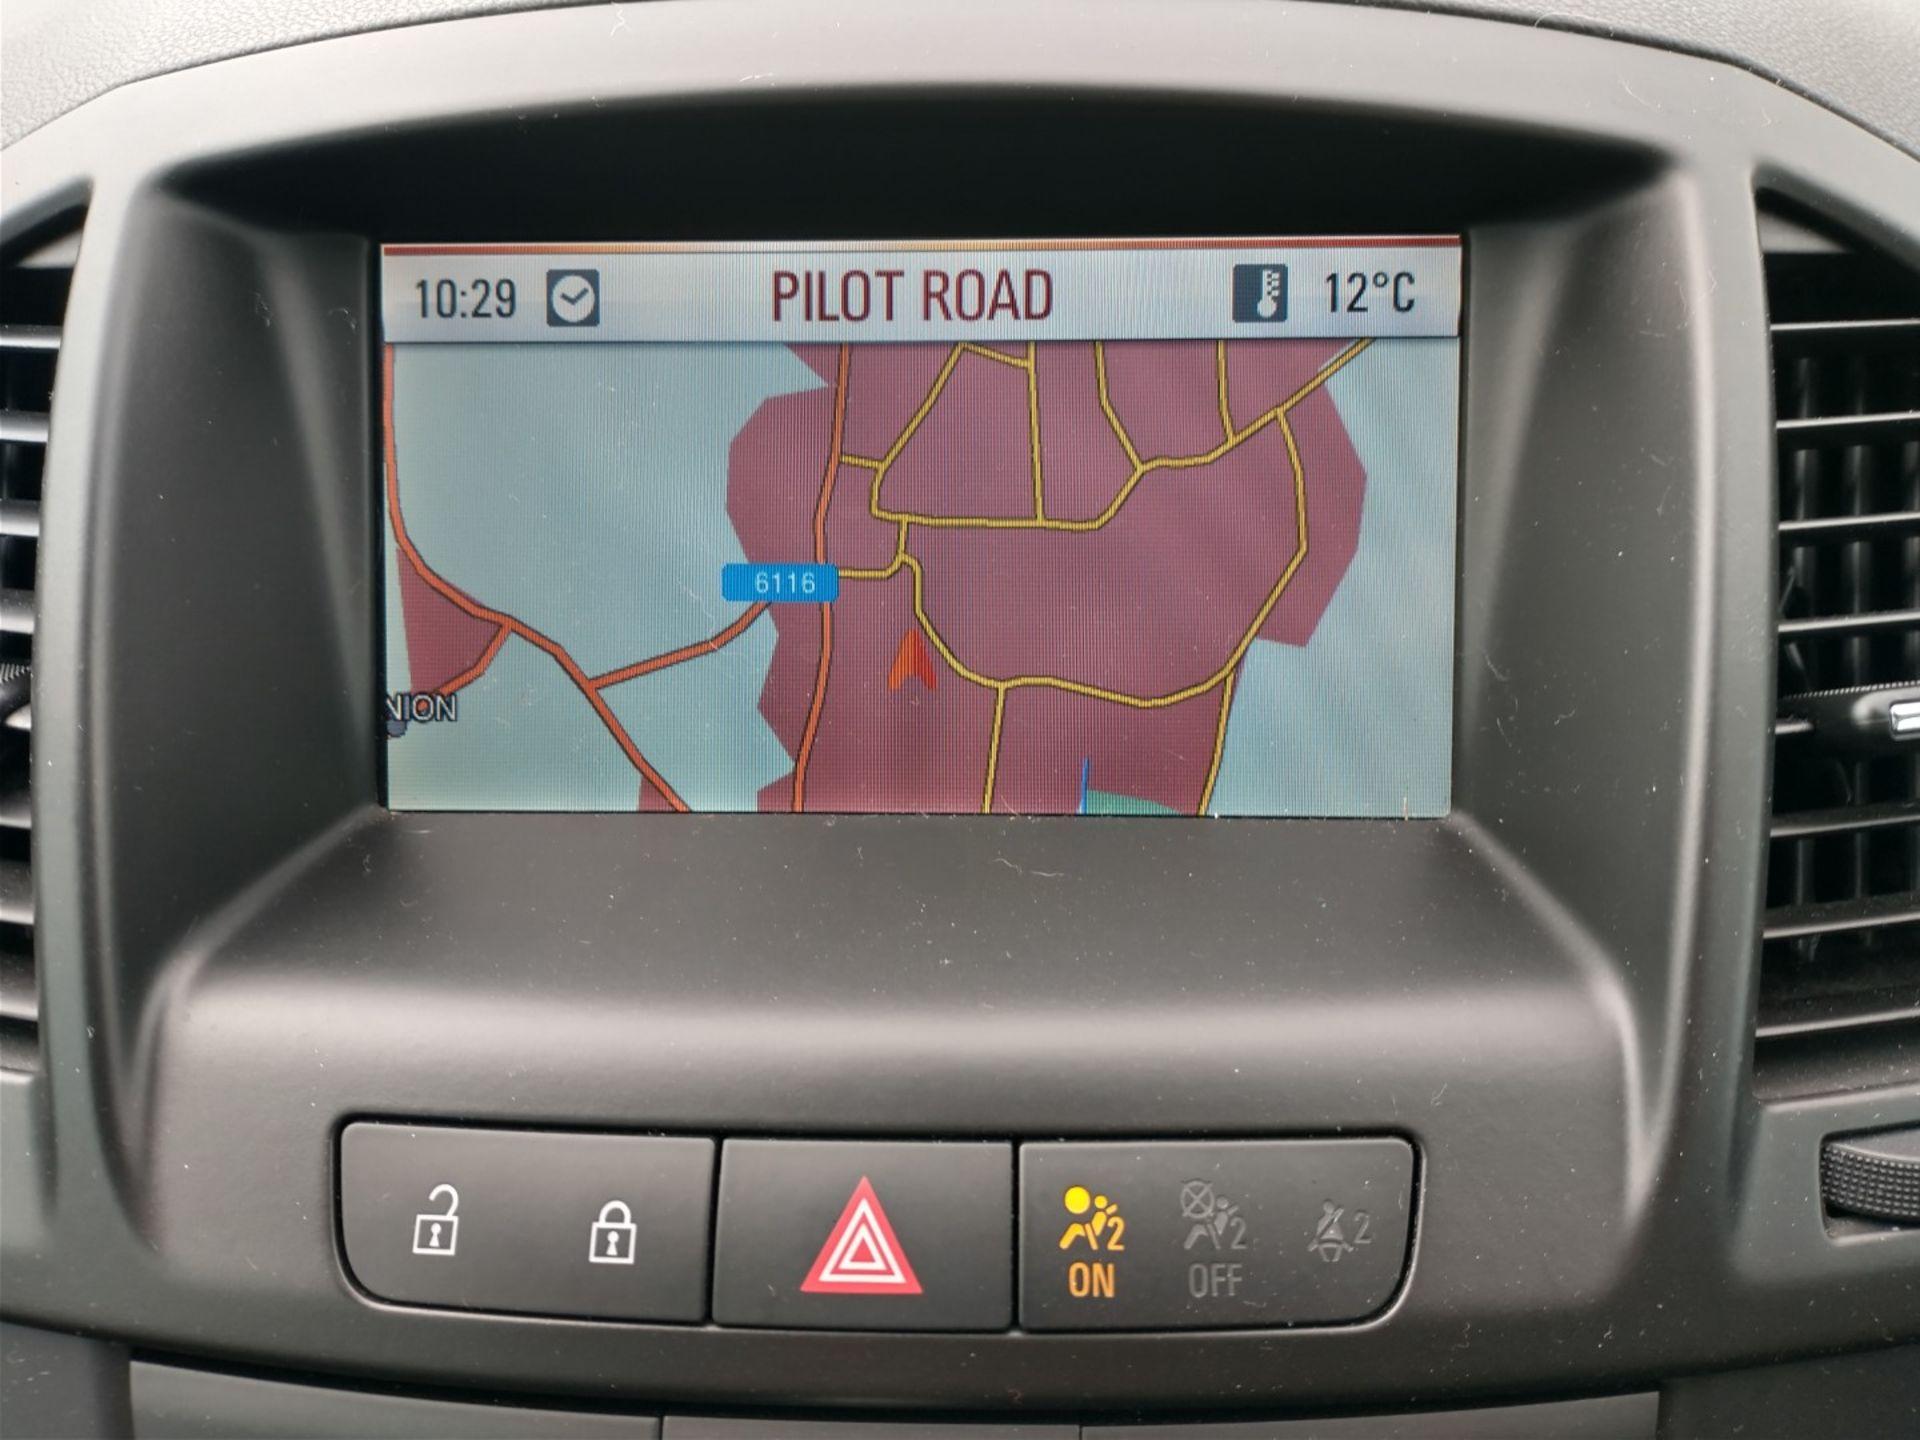 2009 Vauxhall Insignia Elite Nav CDTI 5dr 2.0 Diesel - CL505 - NO VAT ON THE HAMMER - Location: Corb - Image 18 of 22